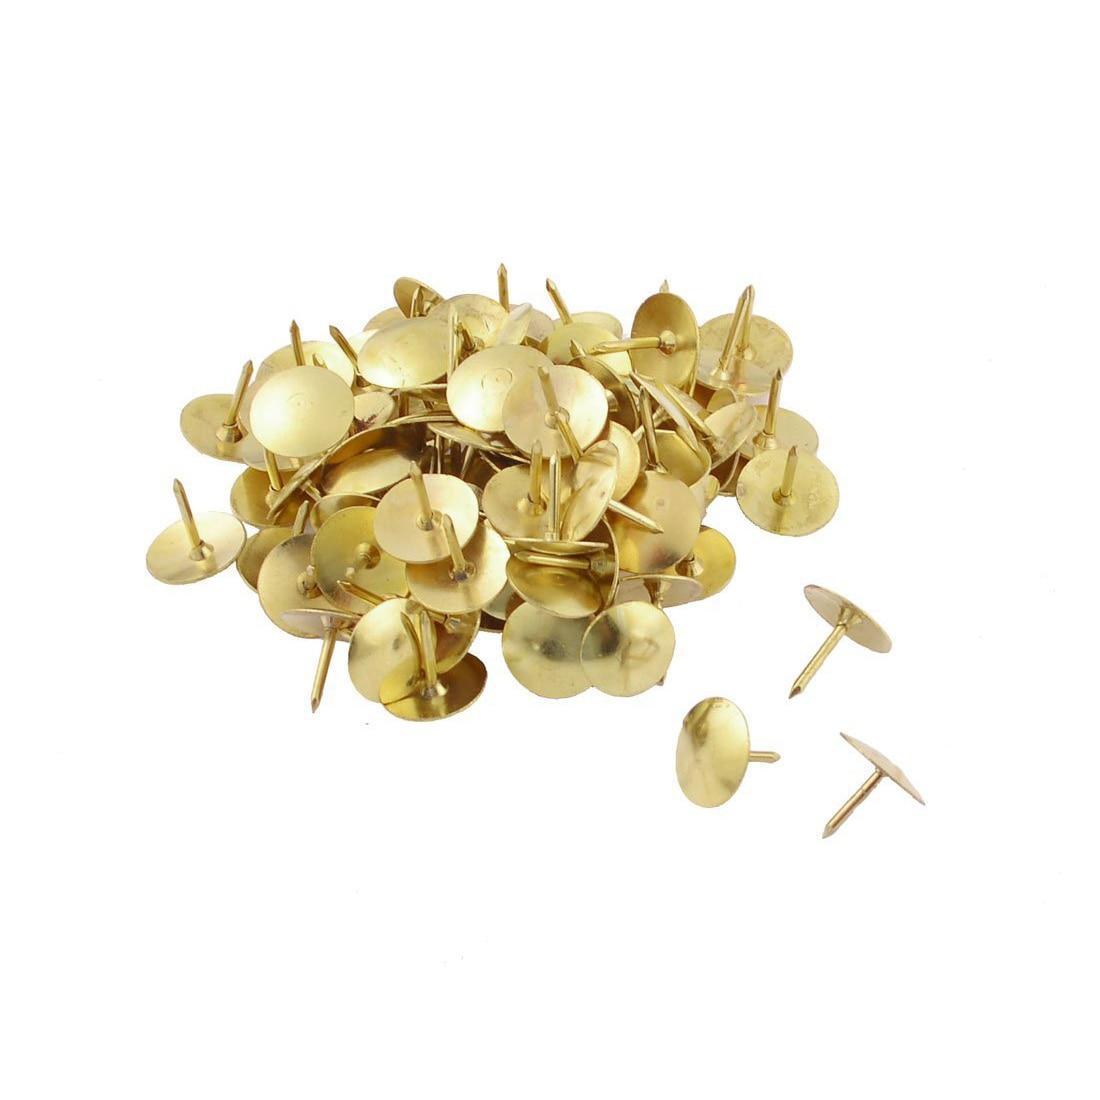 10pack (100 Pcs Pack Office Gold Tone Thumbtacks10pack (100 Pcs Pack Office Gold Tone Thumbtacks